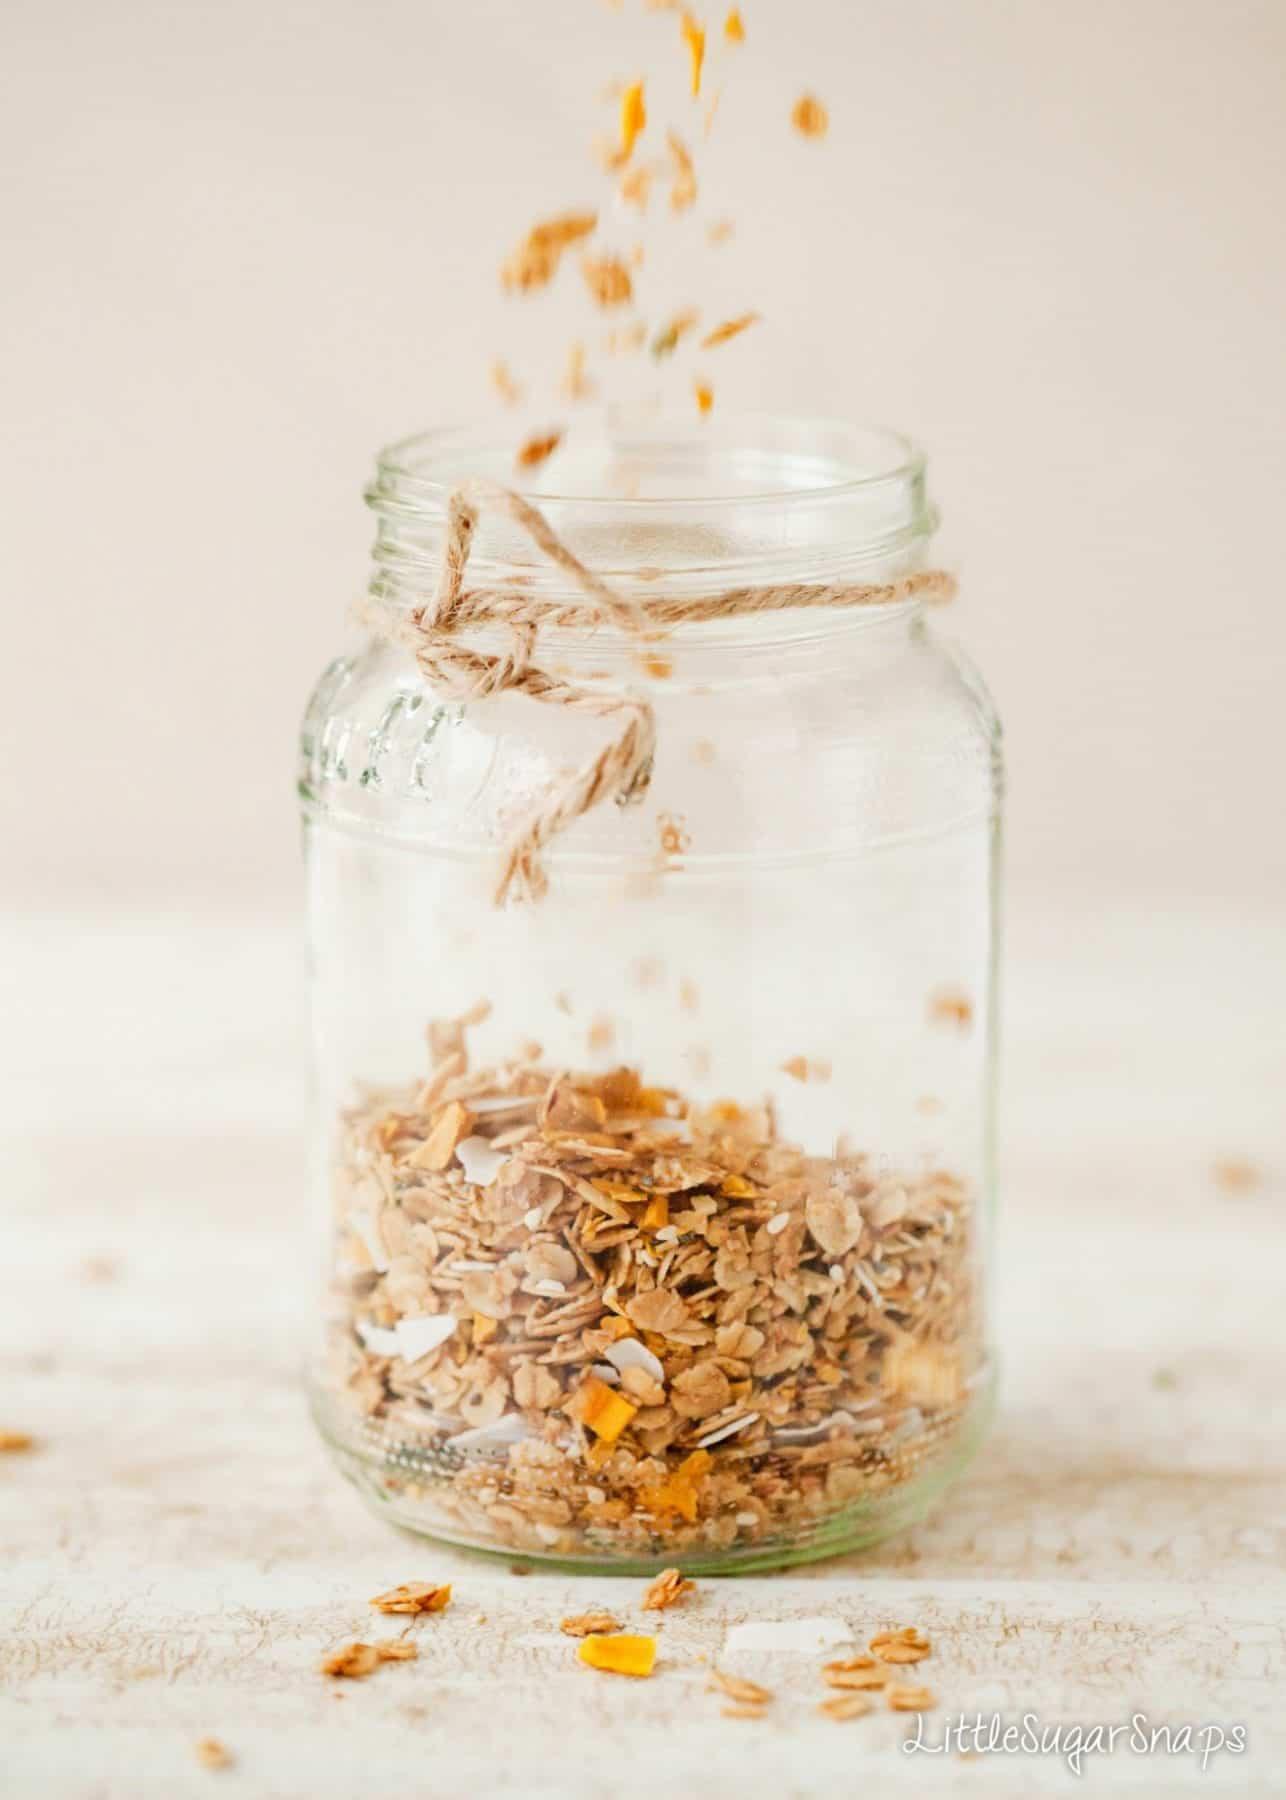 Homemade Granola being poured into a glass jar for storage